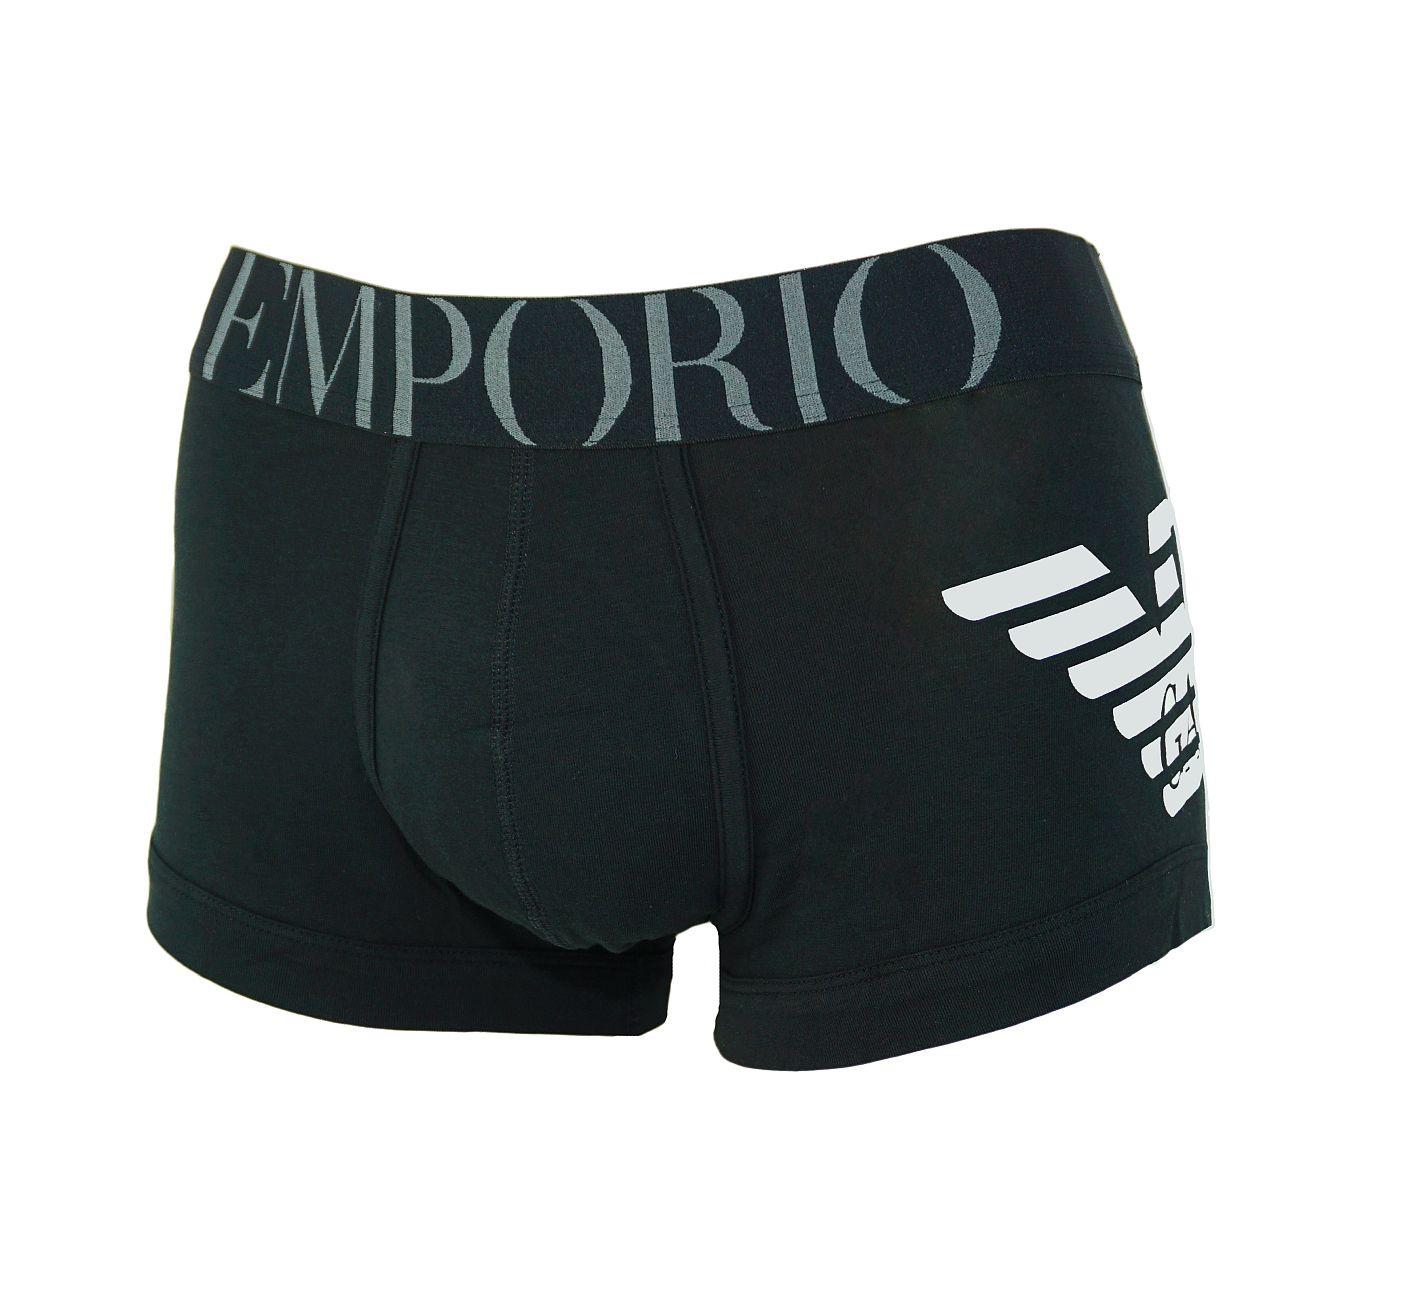 Emporio Armani Trunk Unterhose Short 111866 8P725 00020 NERO F18-EAT2